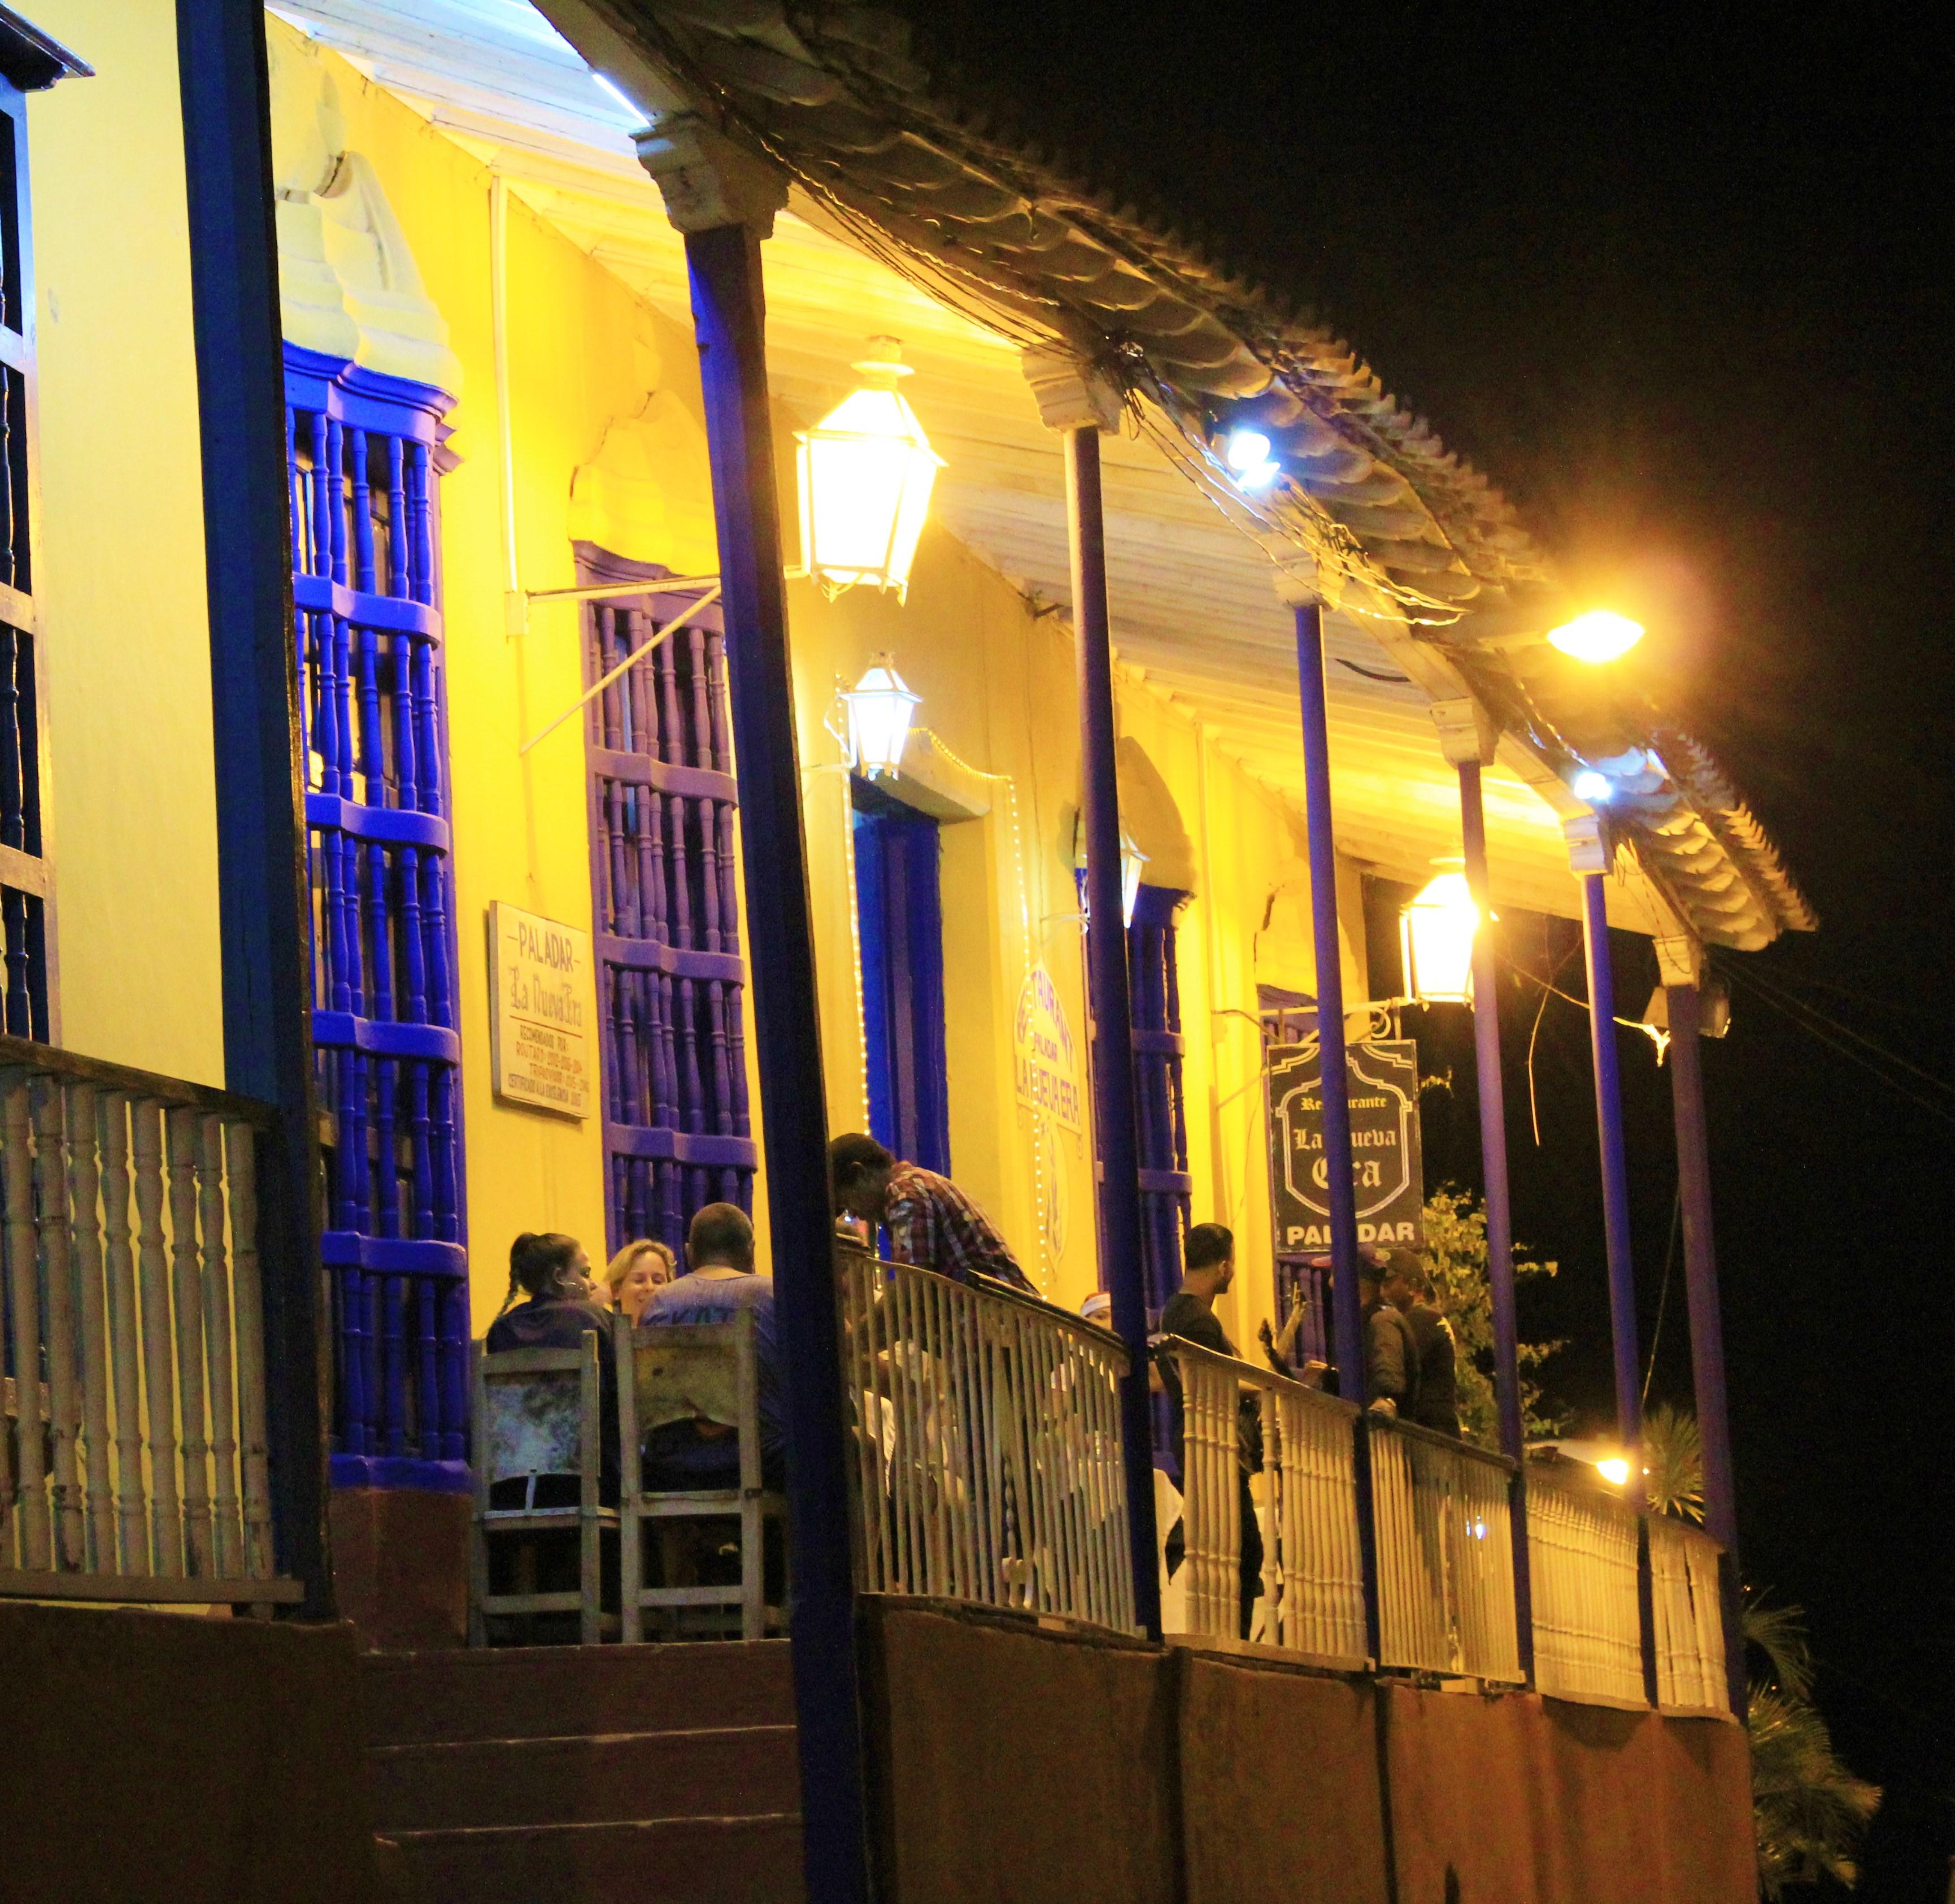 Trinidad-Cuba-Restaurant A Cuban Road Trip, Part 2 - Trinidad Cuba Trinidad